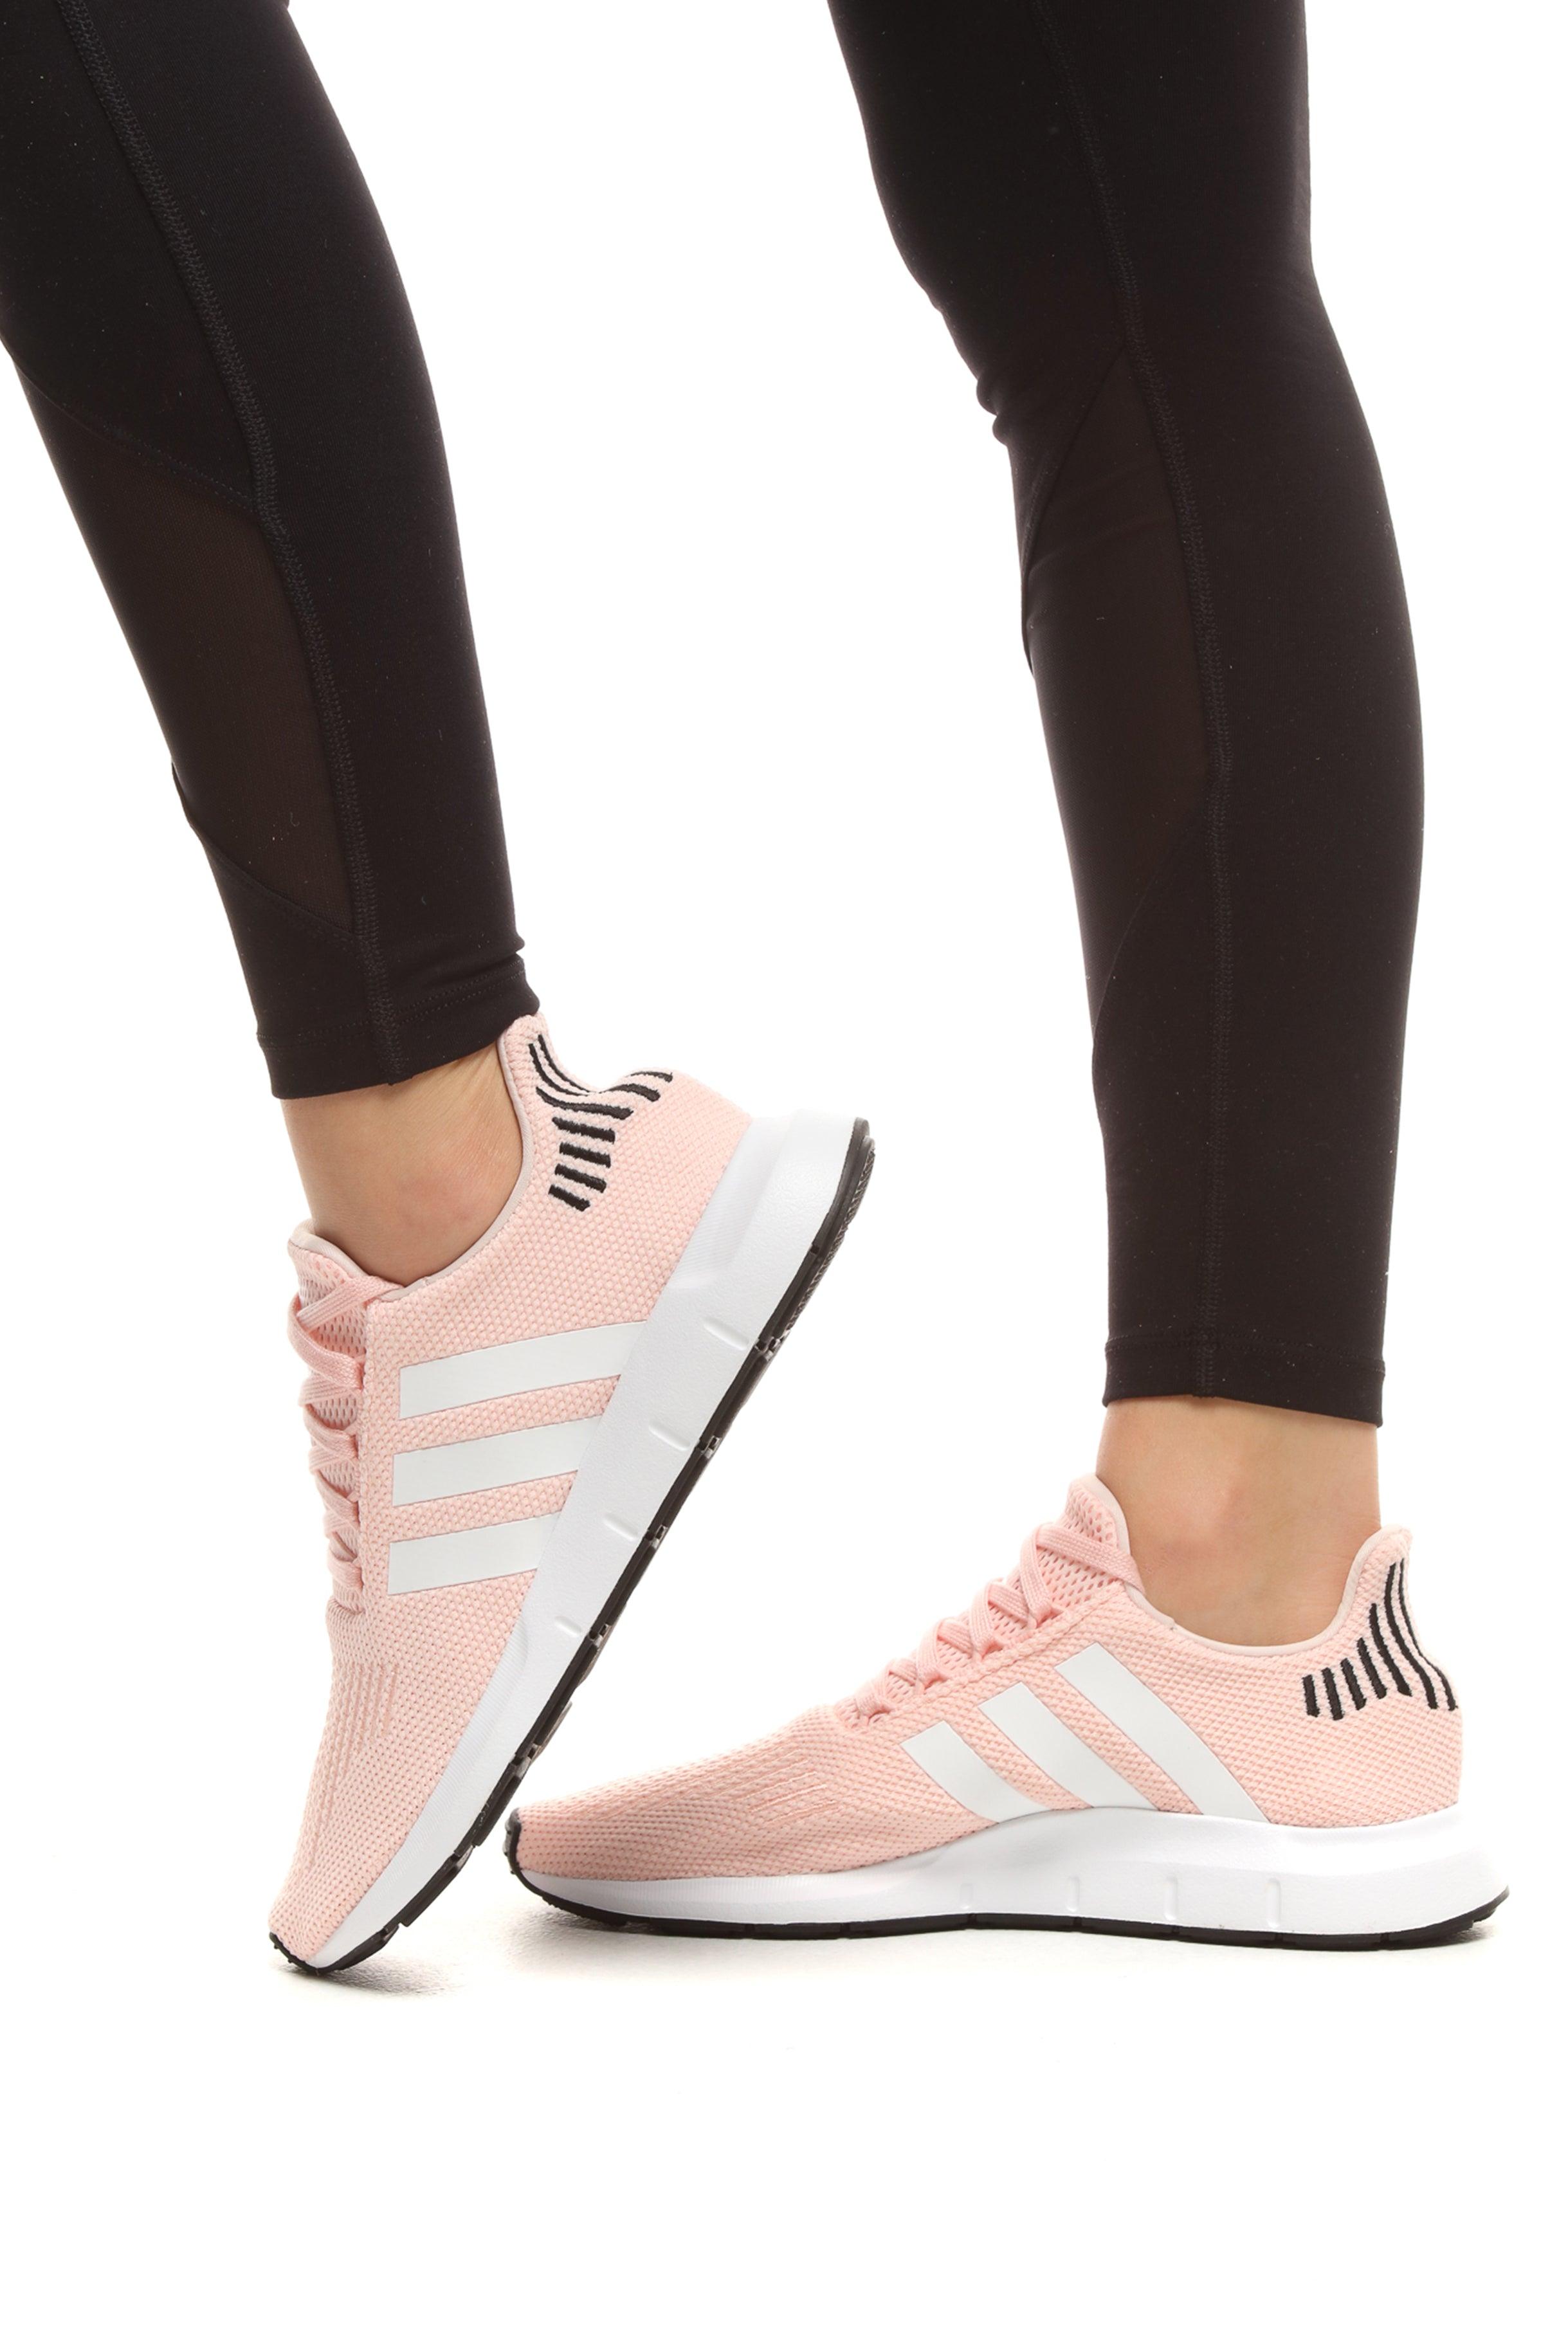 womens pink adidas swift run